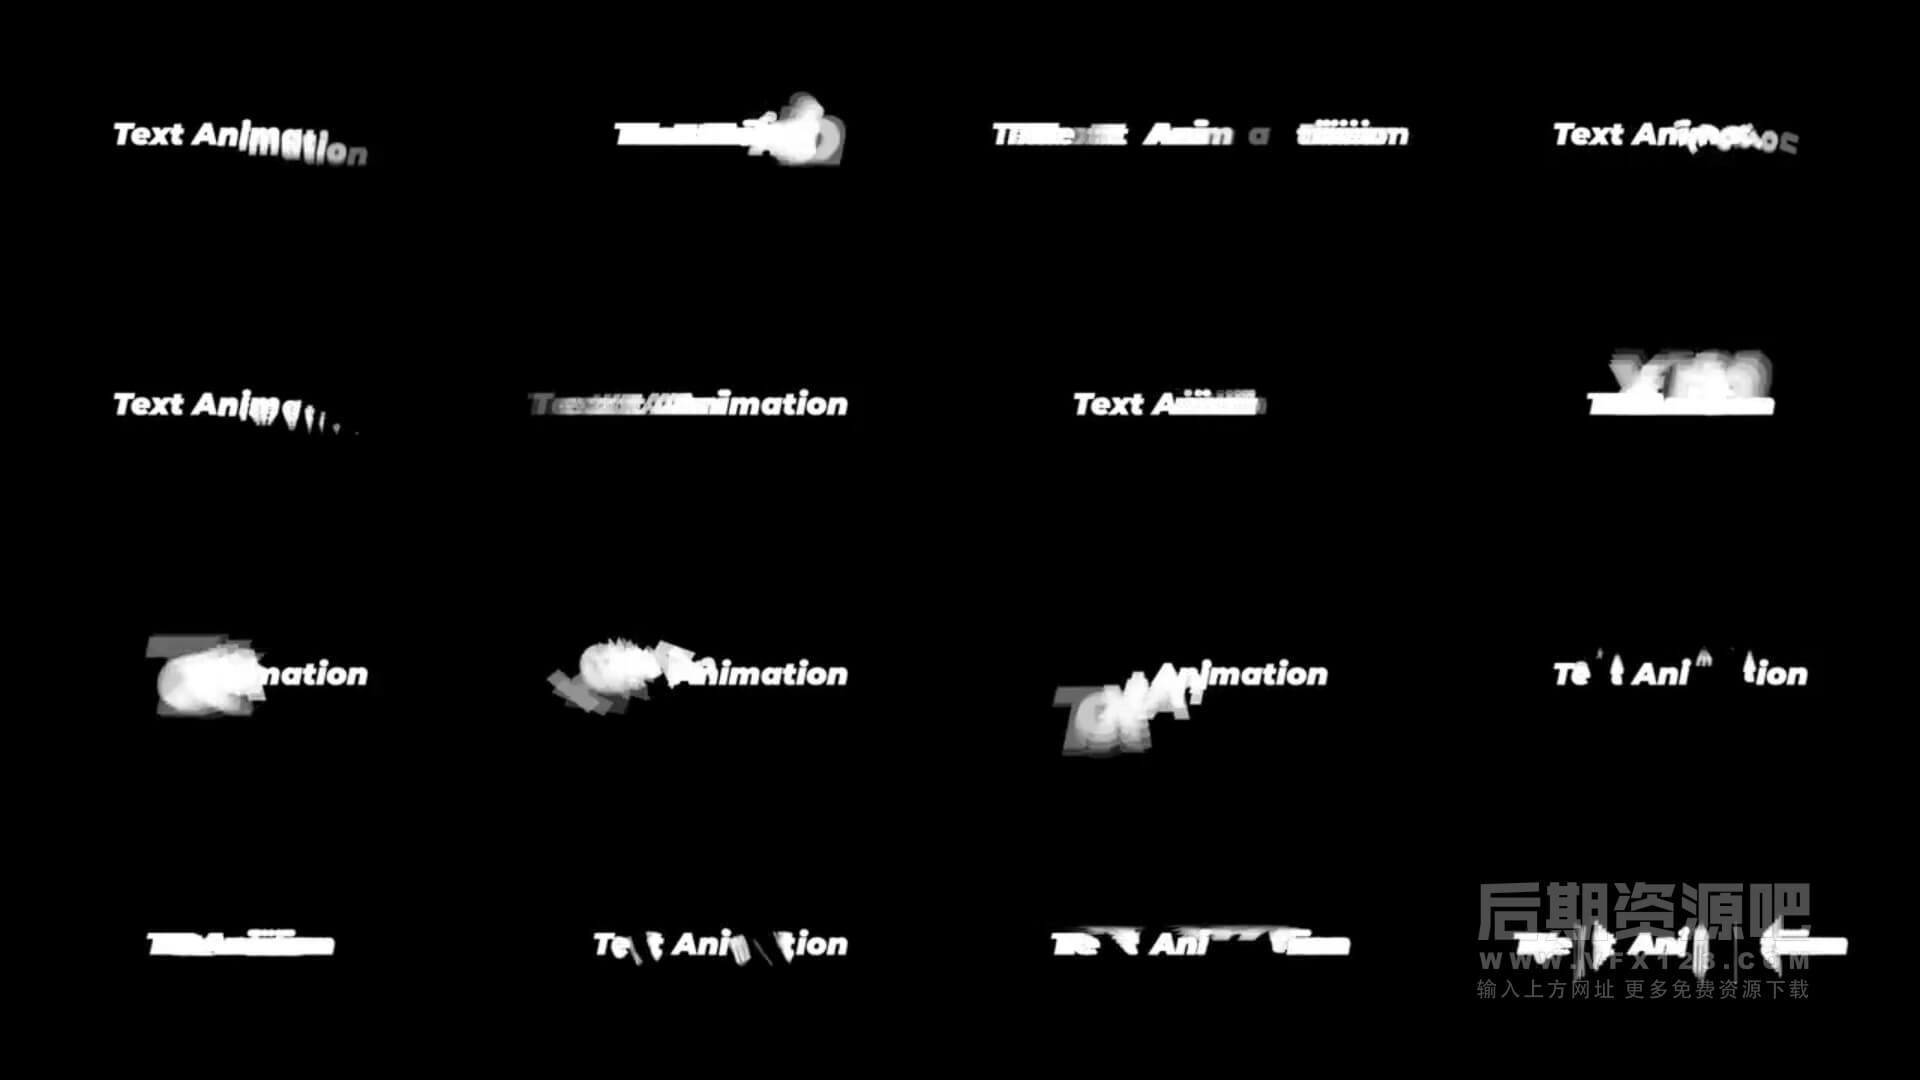 fcpx标题插件 16组跟踪逐字闪现动画效果标题模板 Trace Text Animations